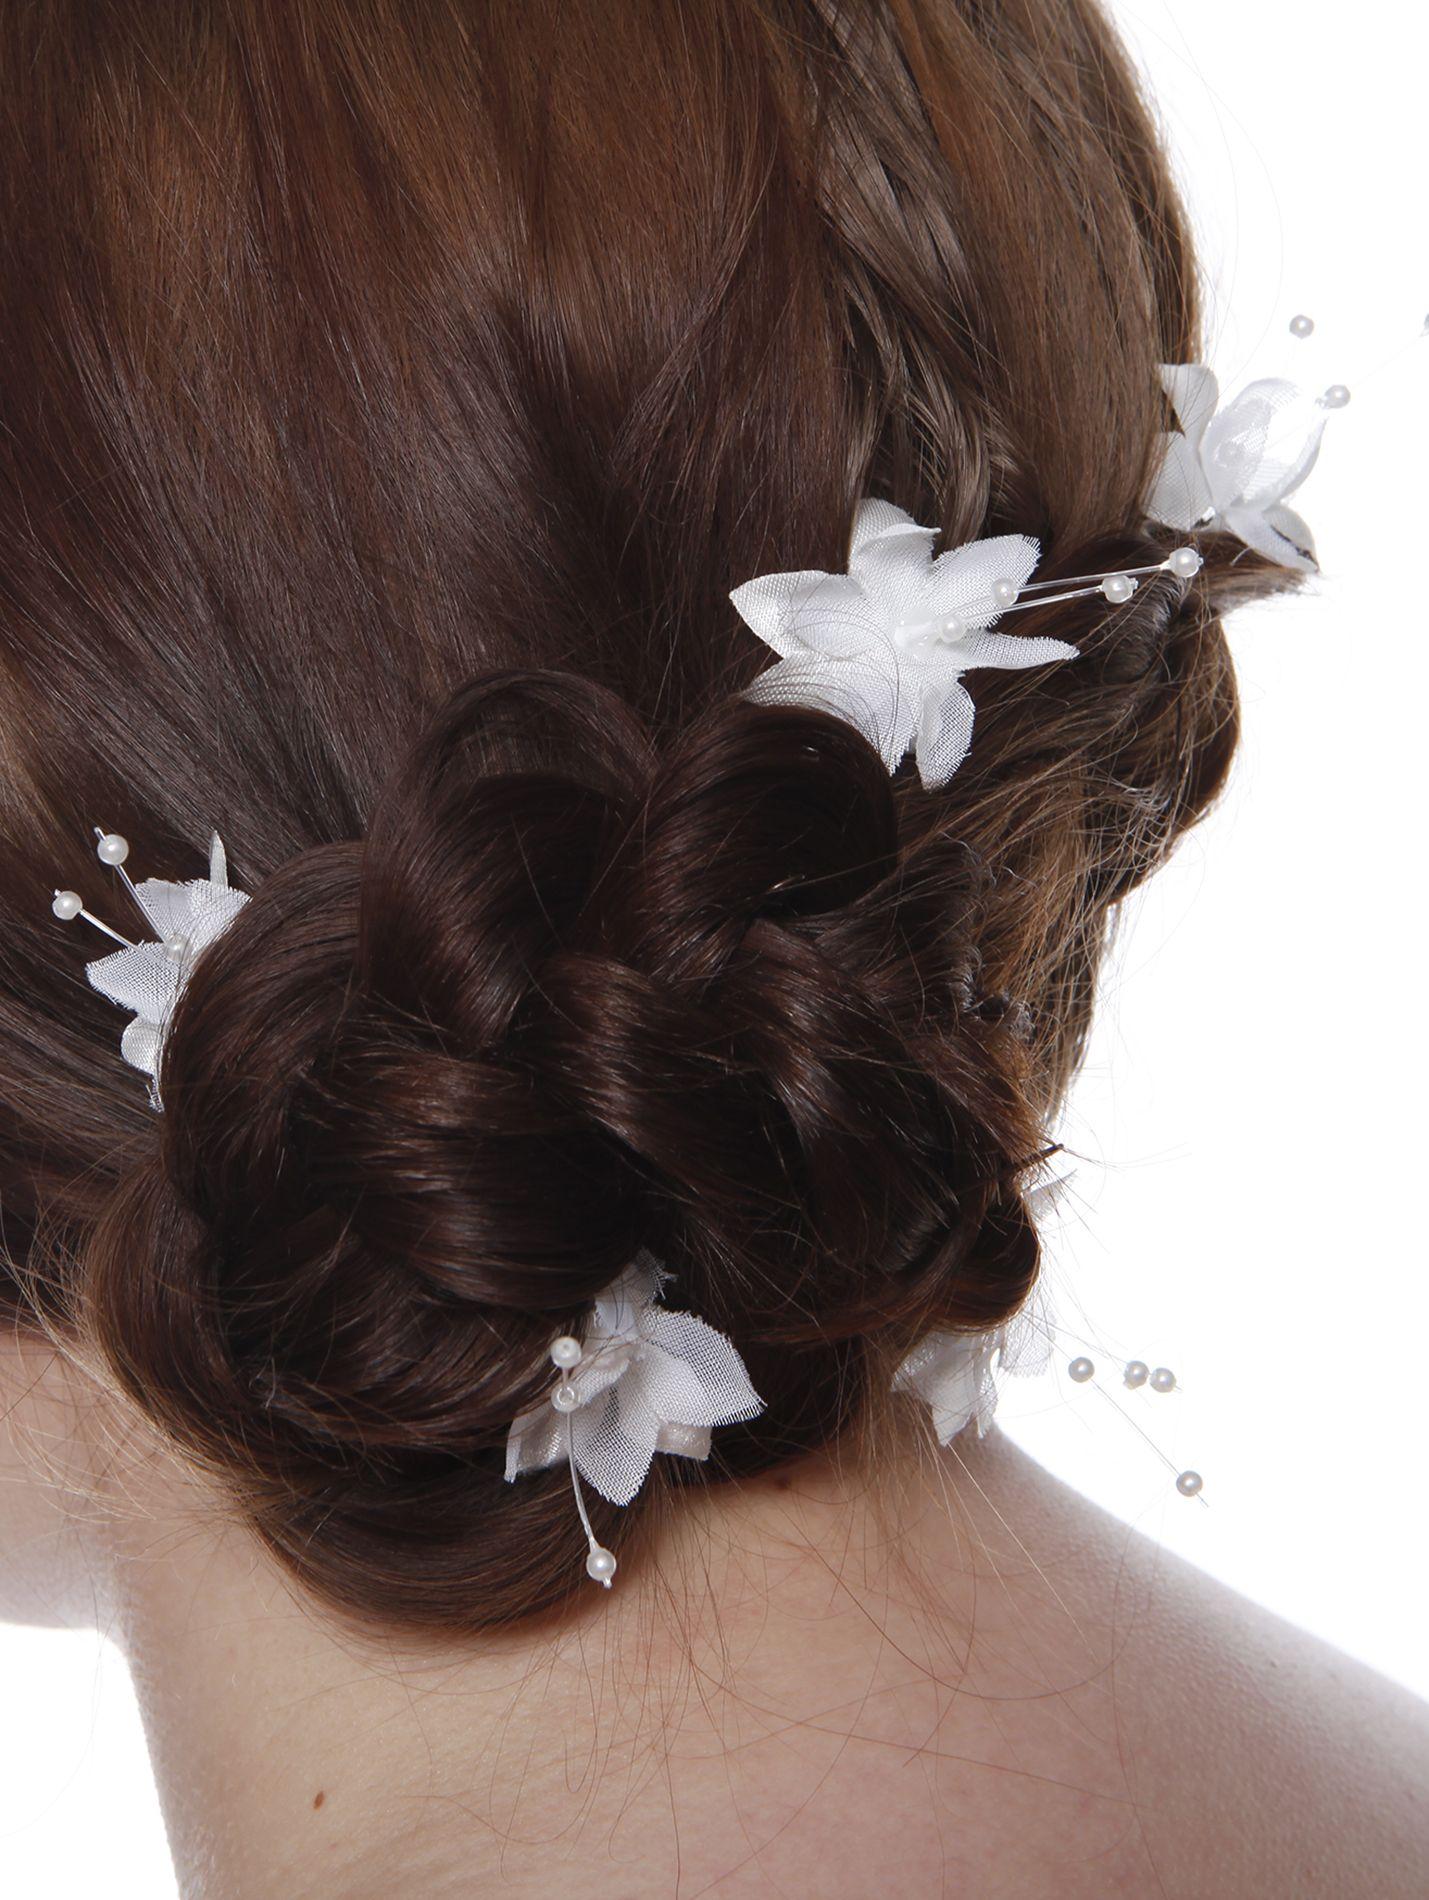 Bridal hair accessories babys breath - Stargem Handmade White Flowers Hairpins Made With White Baby S Breath Bridal Hair Accessoriesbaby S